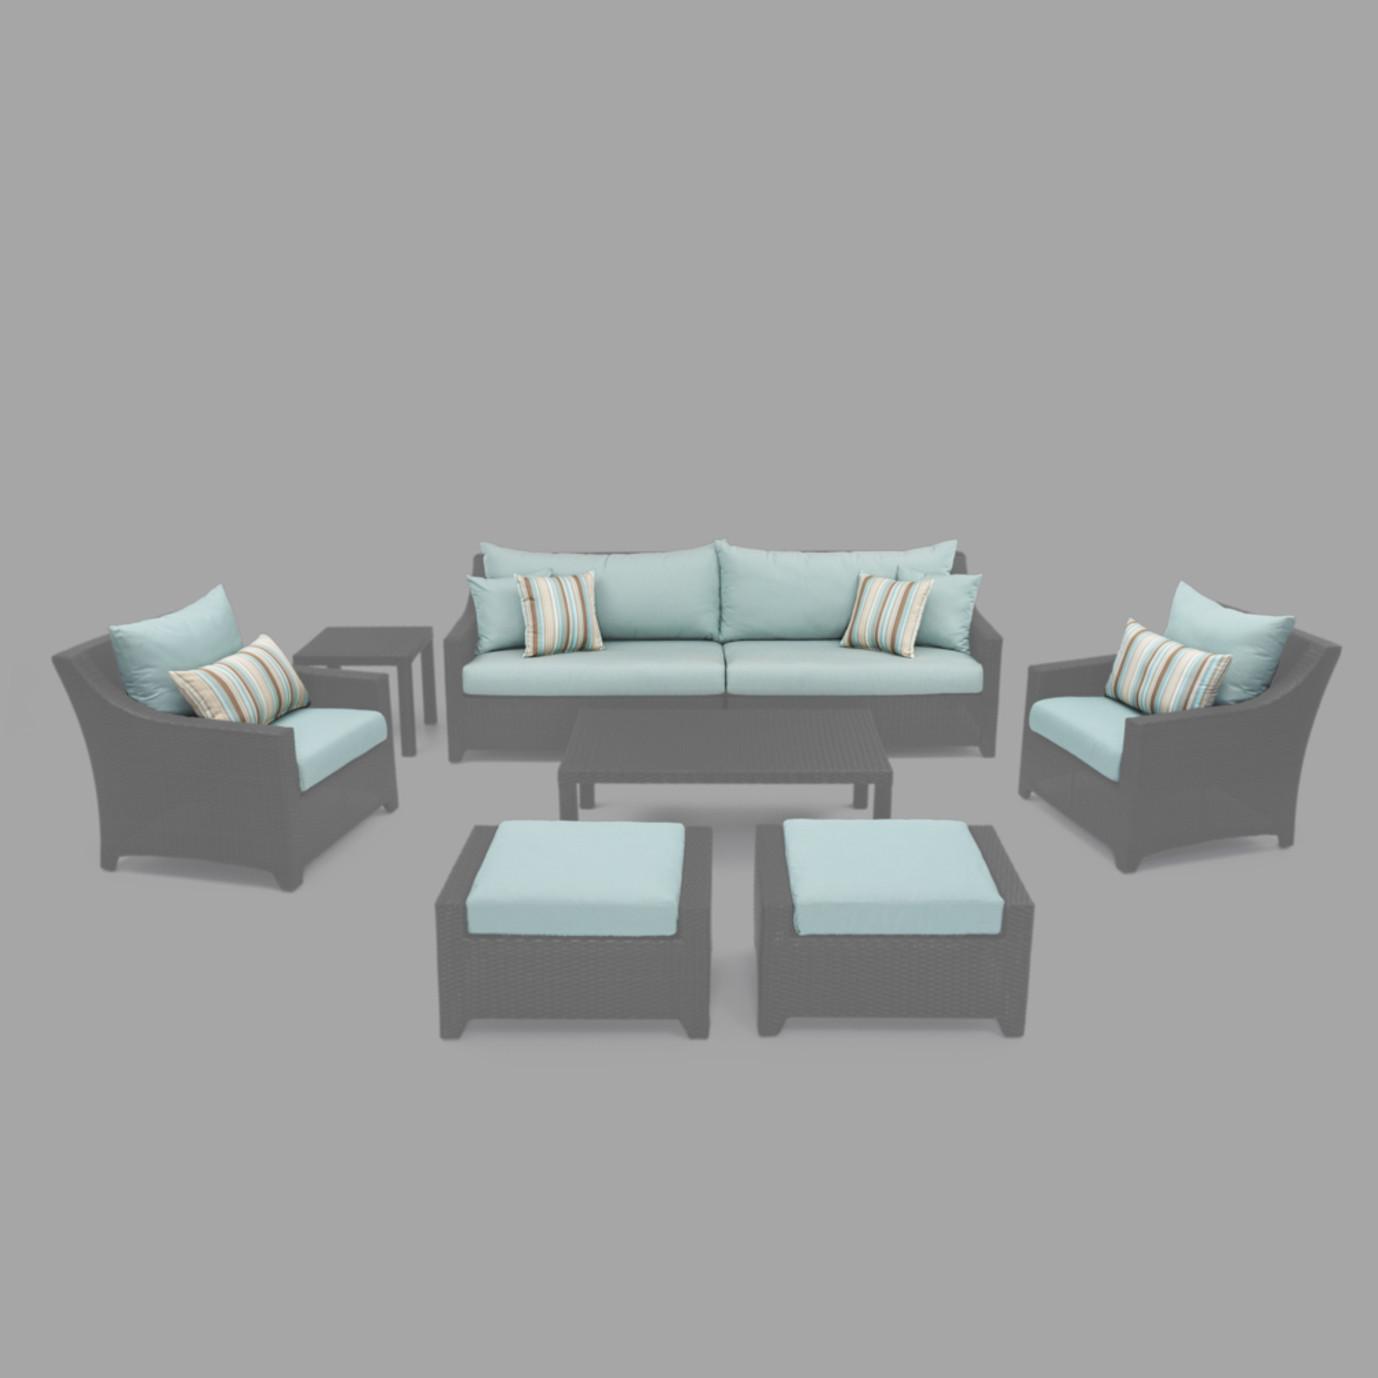 Modular Outdoor 8 Piece Club Cushion Cover Set - Bliss Blue